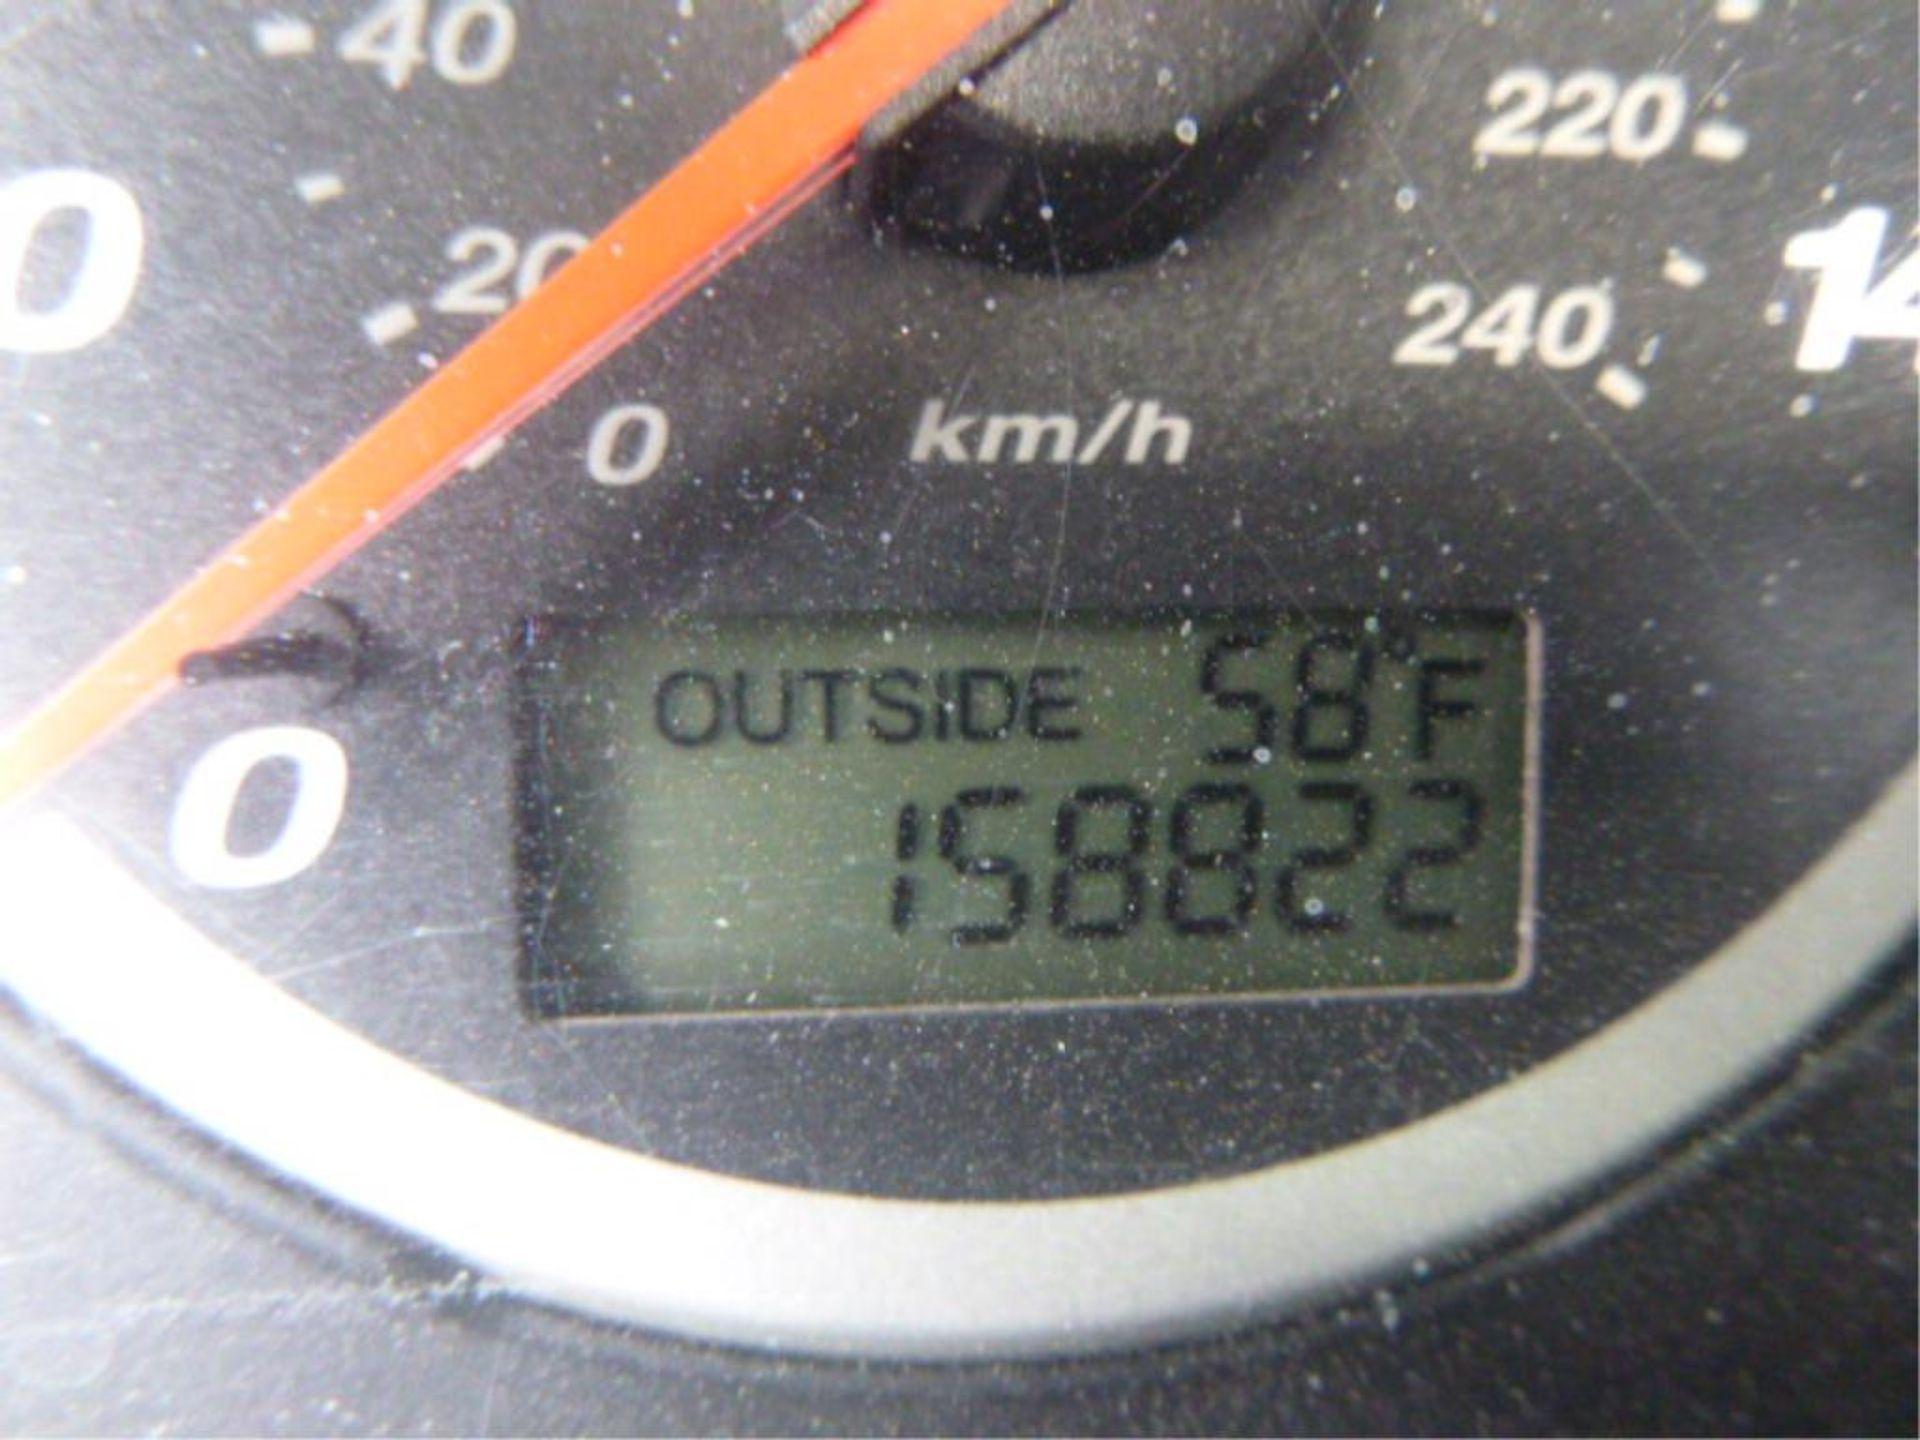 2005 Honda CR-V - Image 13 of 14